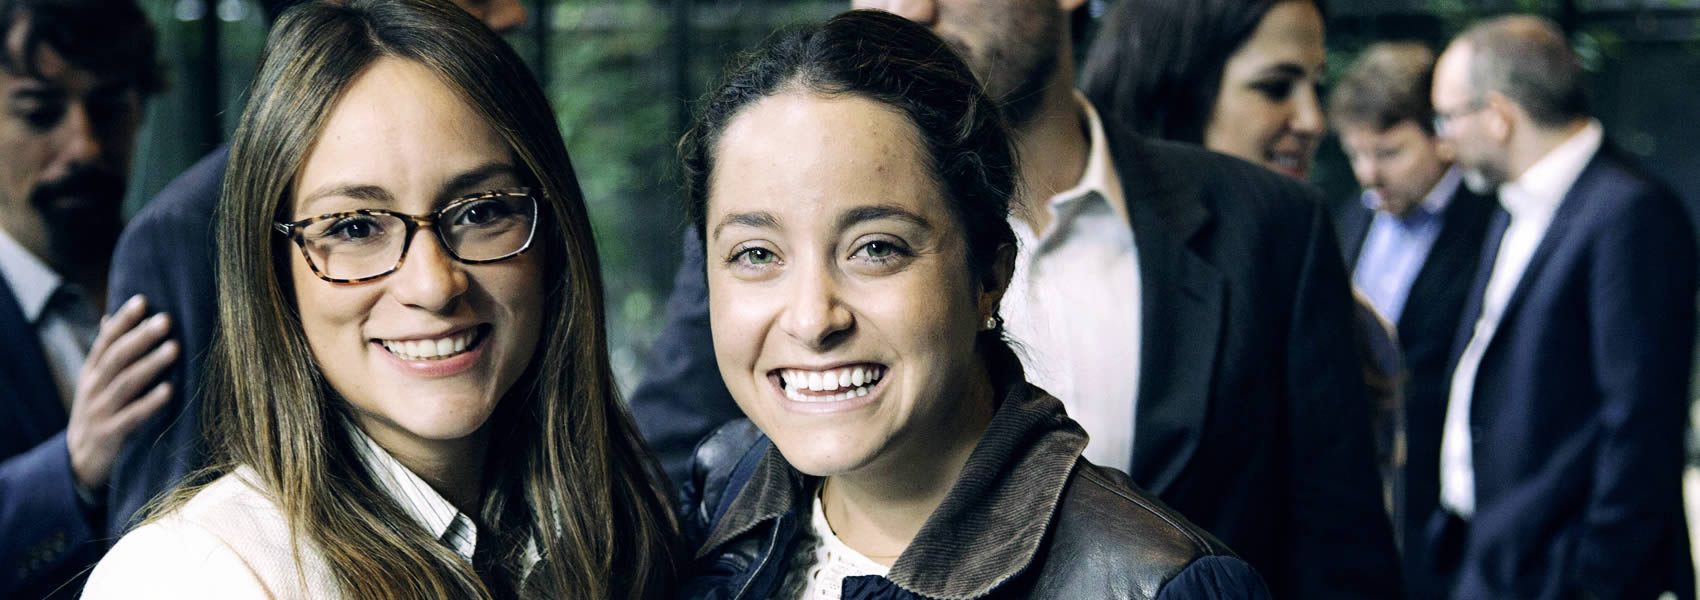 foto de dos chicas en evento